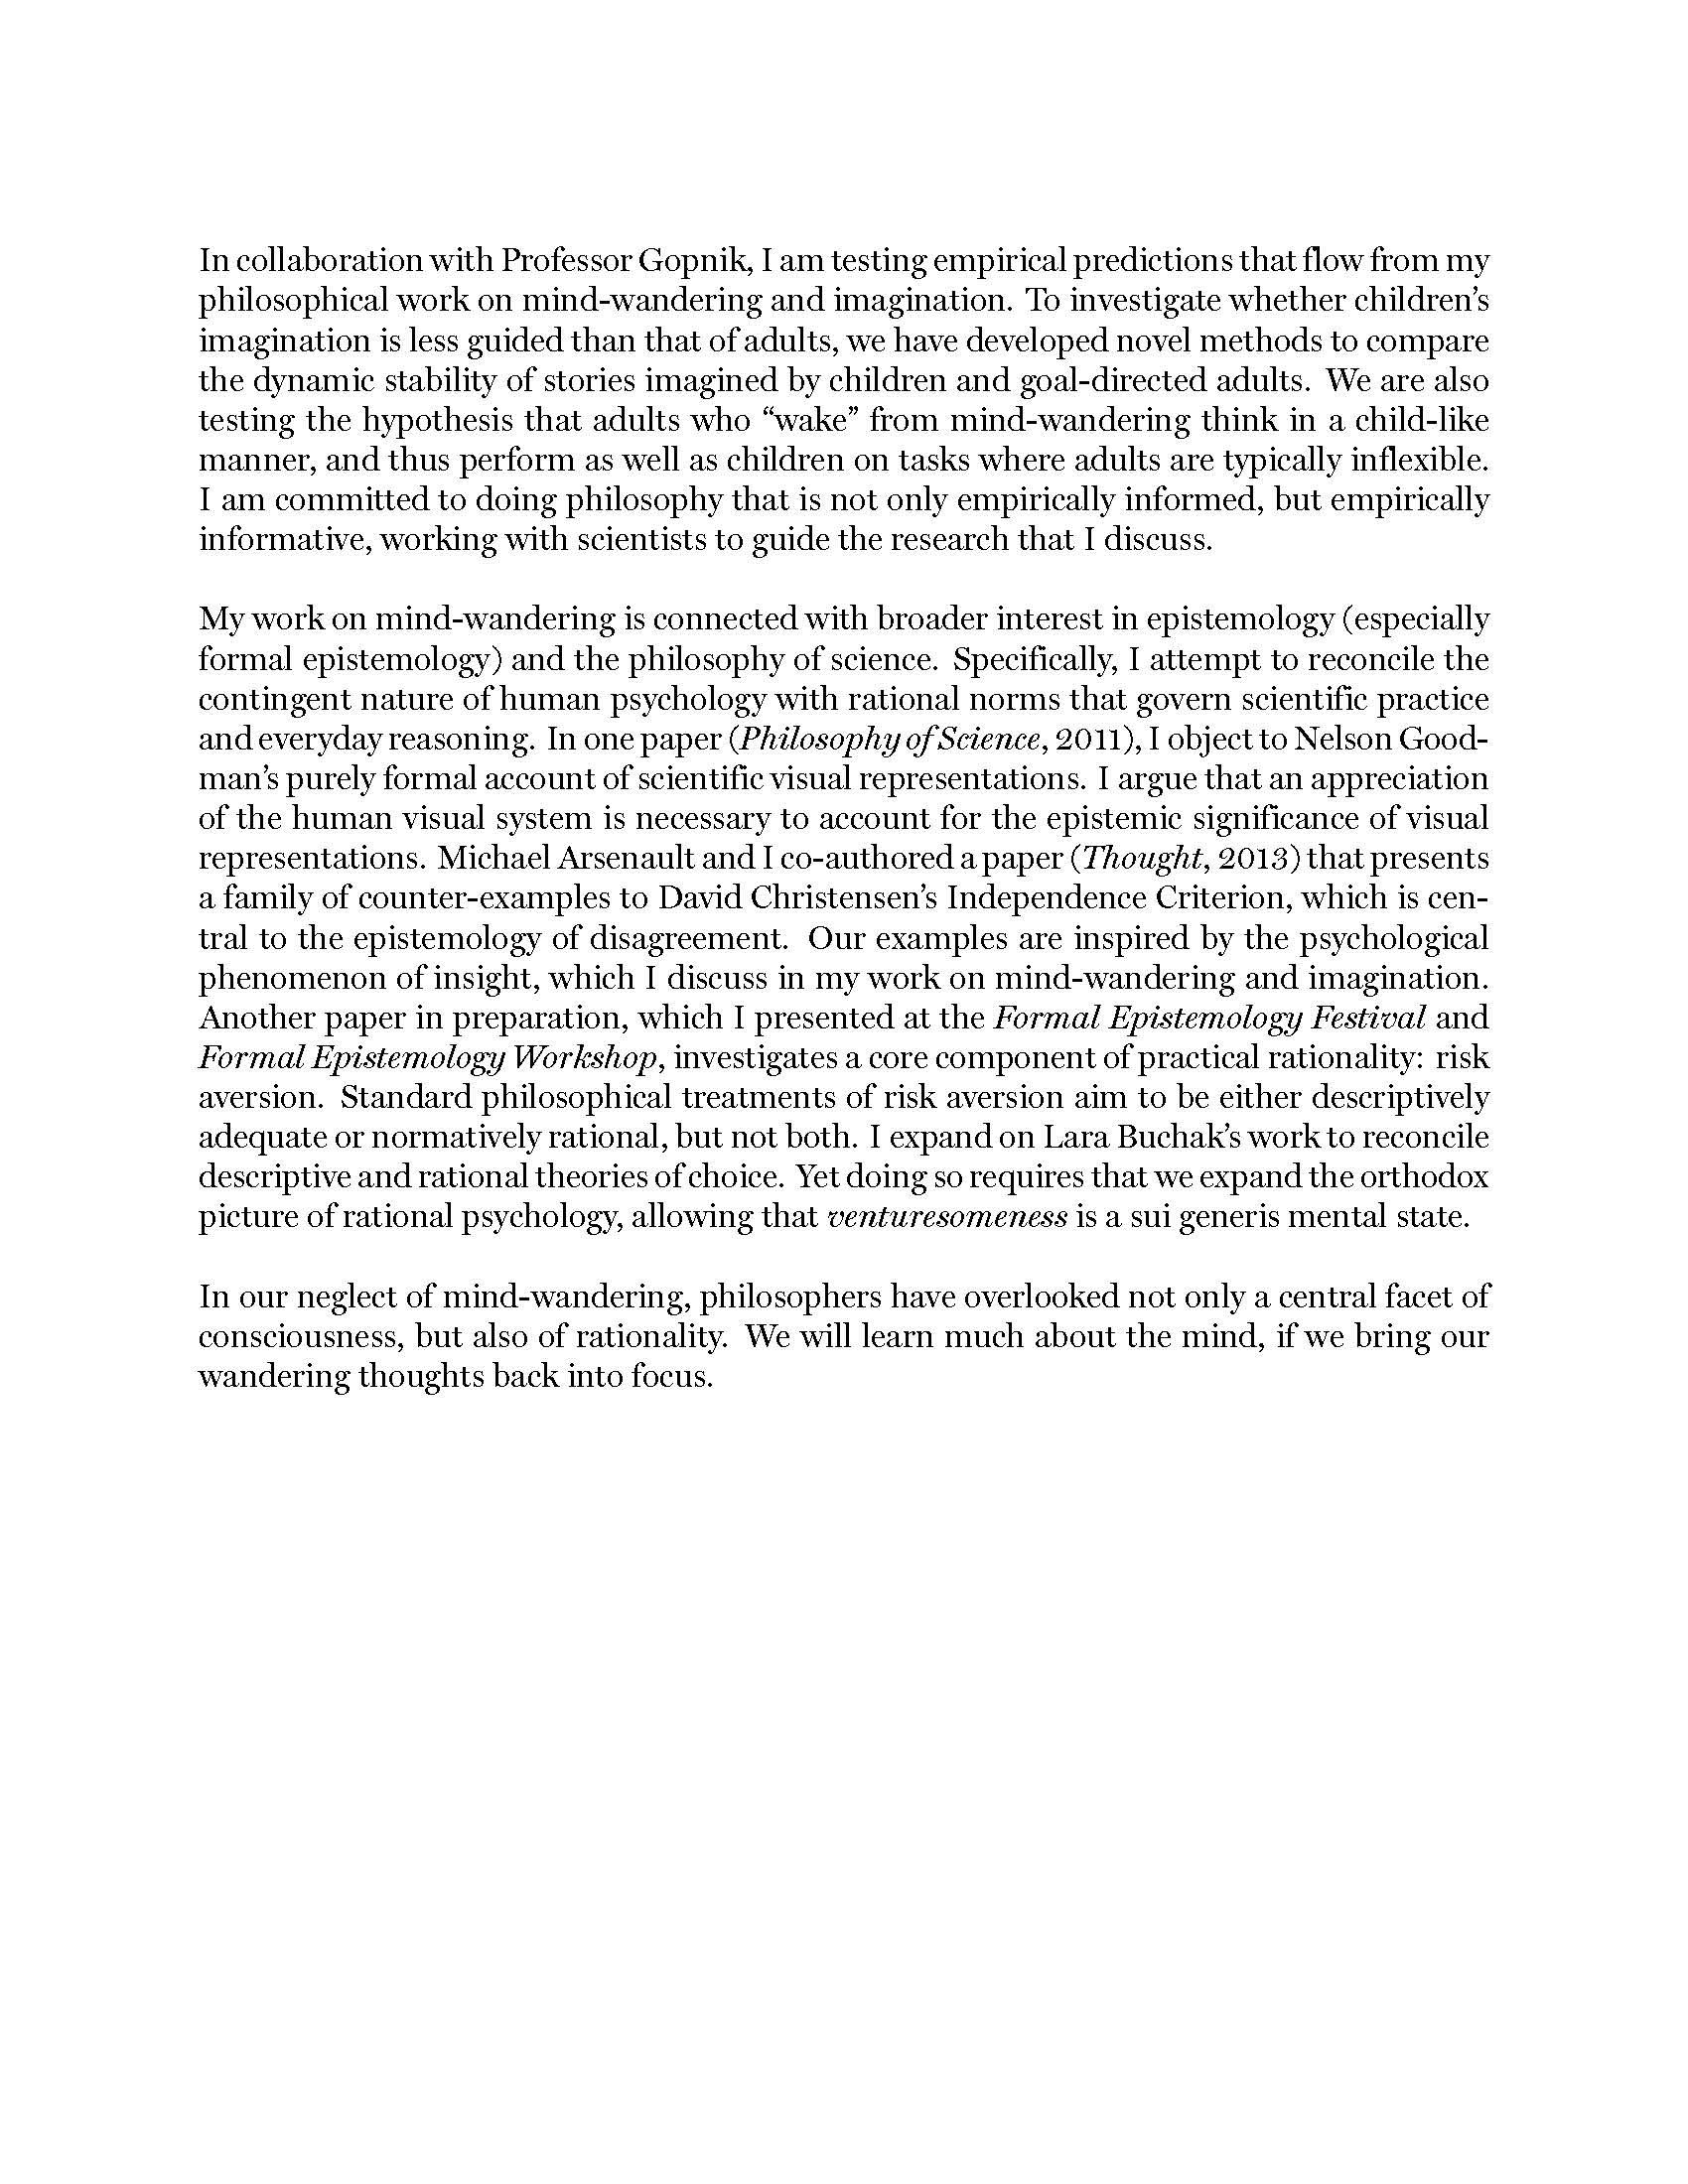 Irving CV - March 26 2017 (statement)_Page_9.jpg